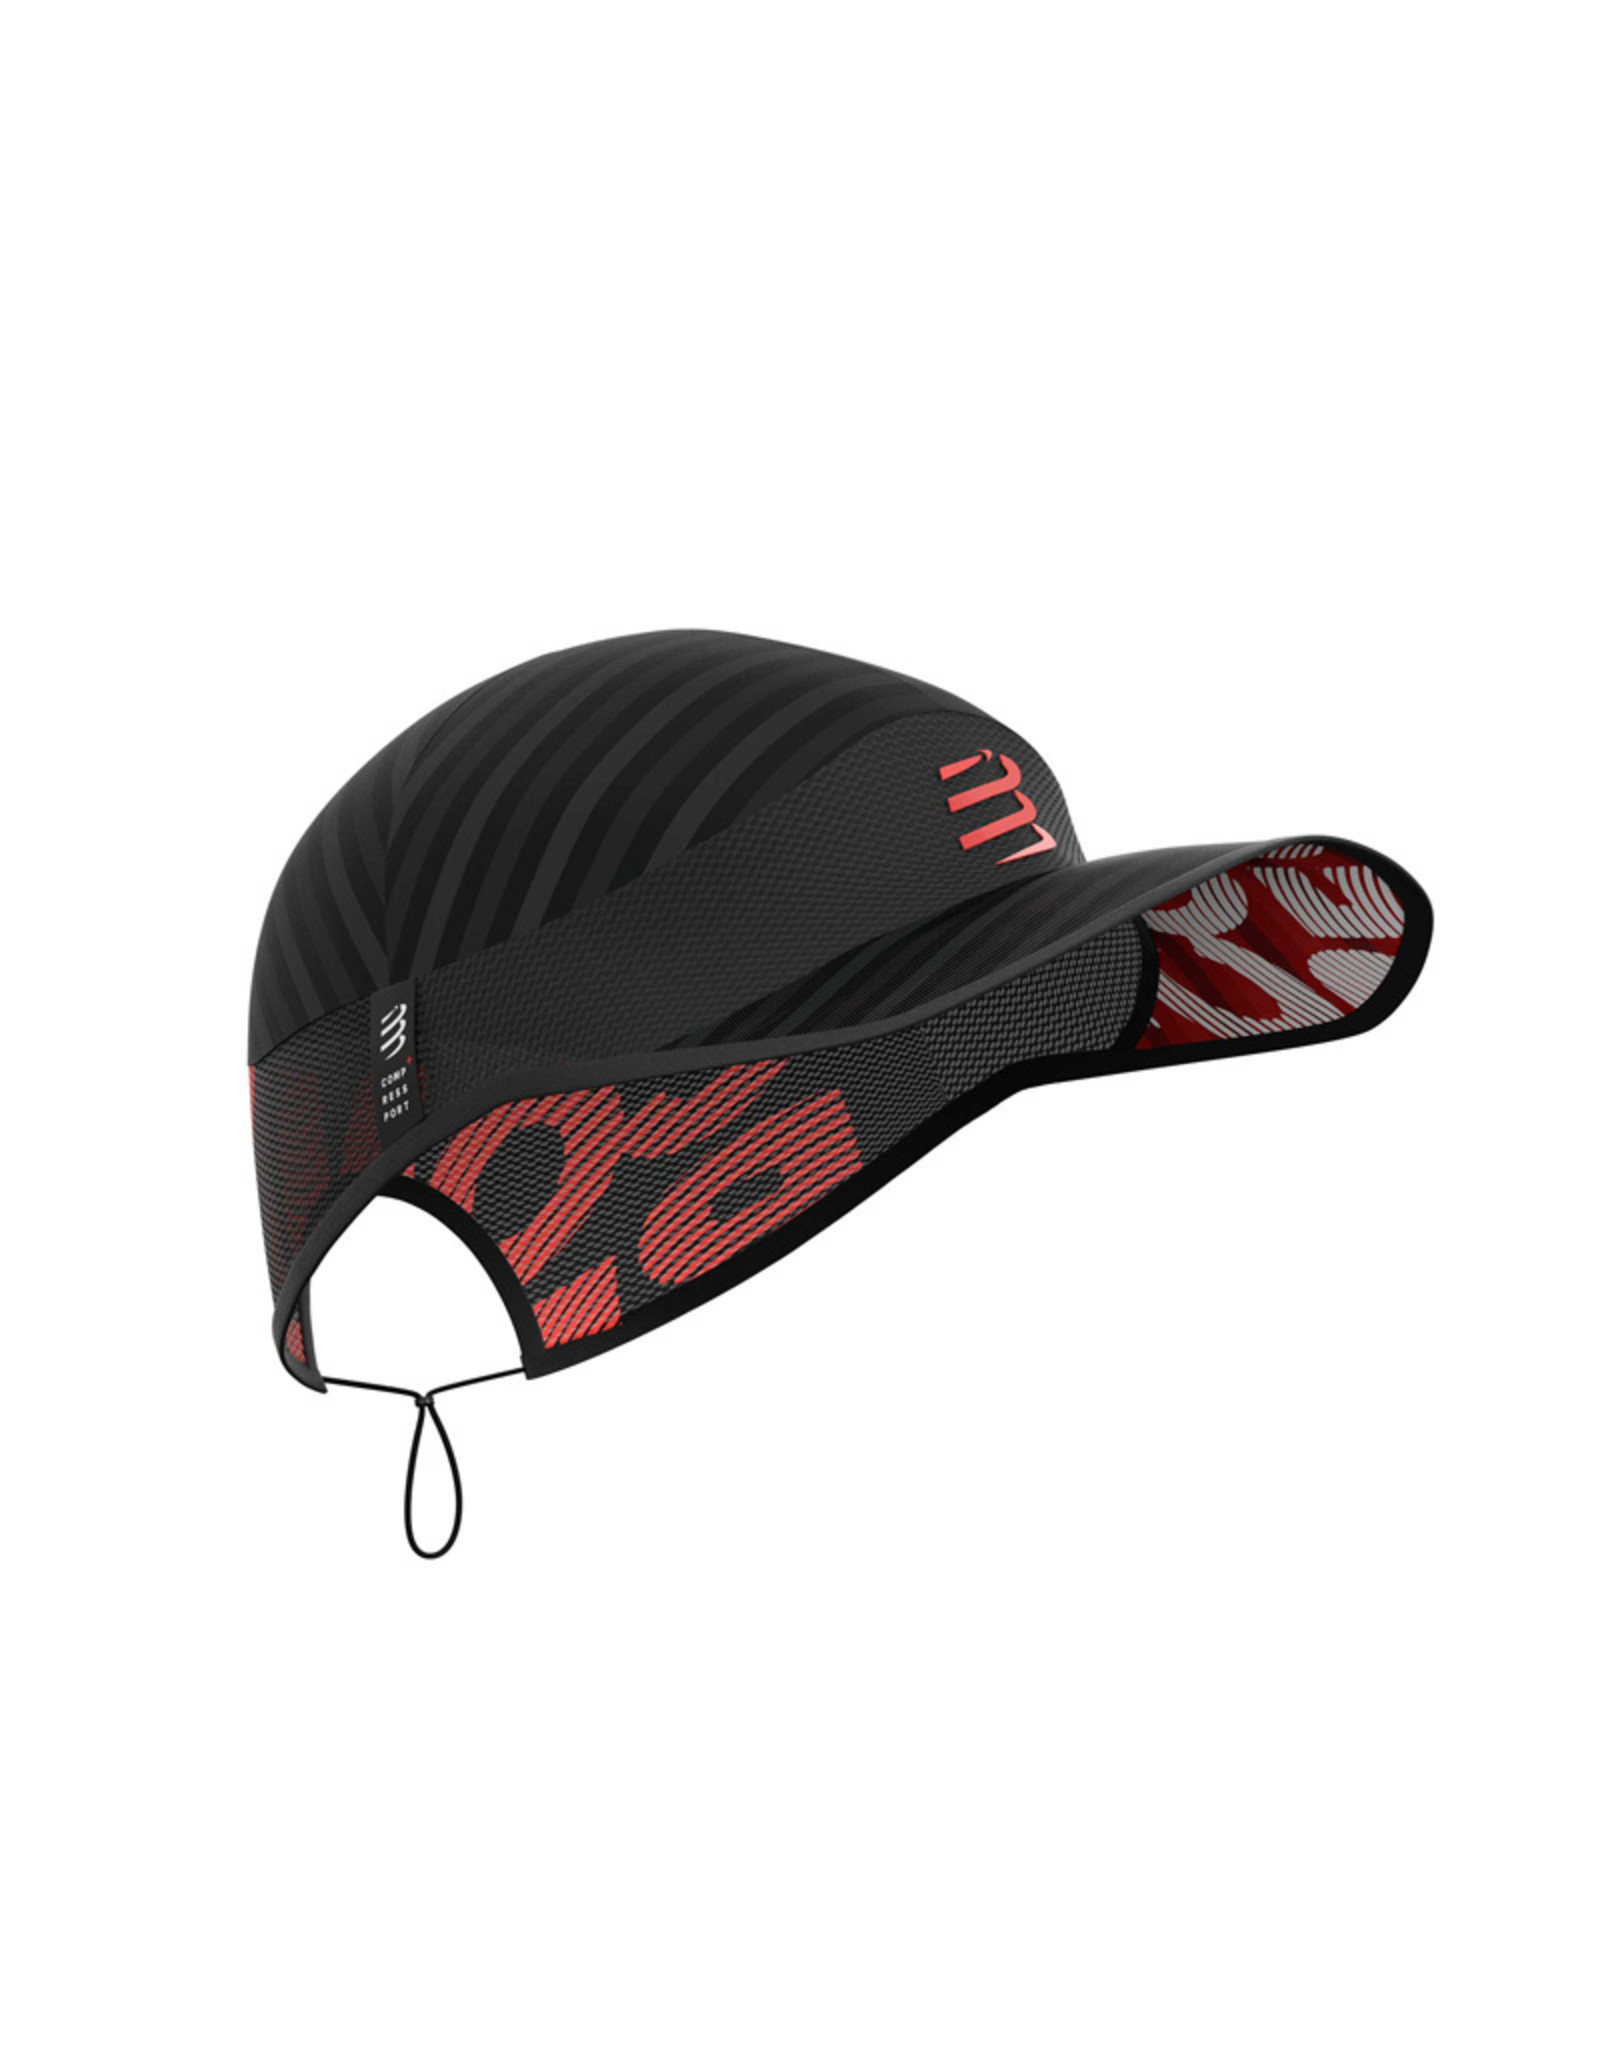 Compressport Pro Racing Cap Casquette Pour Running - Noir